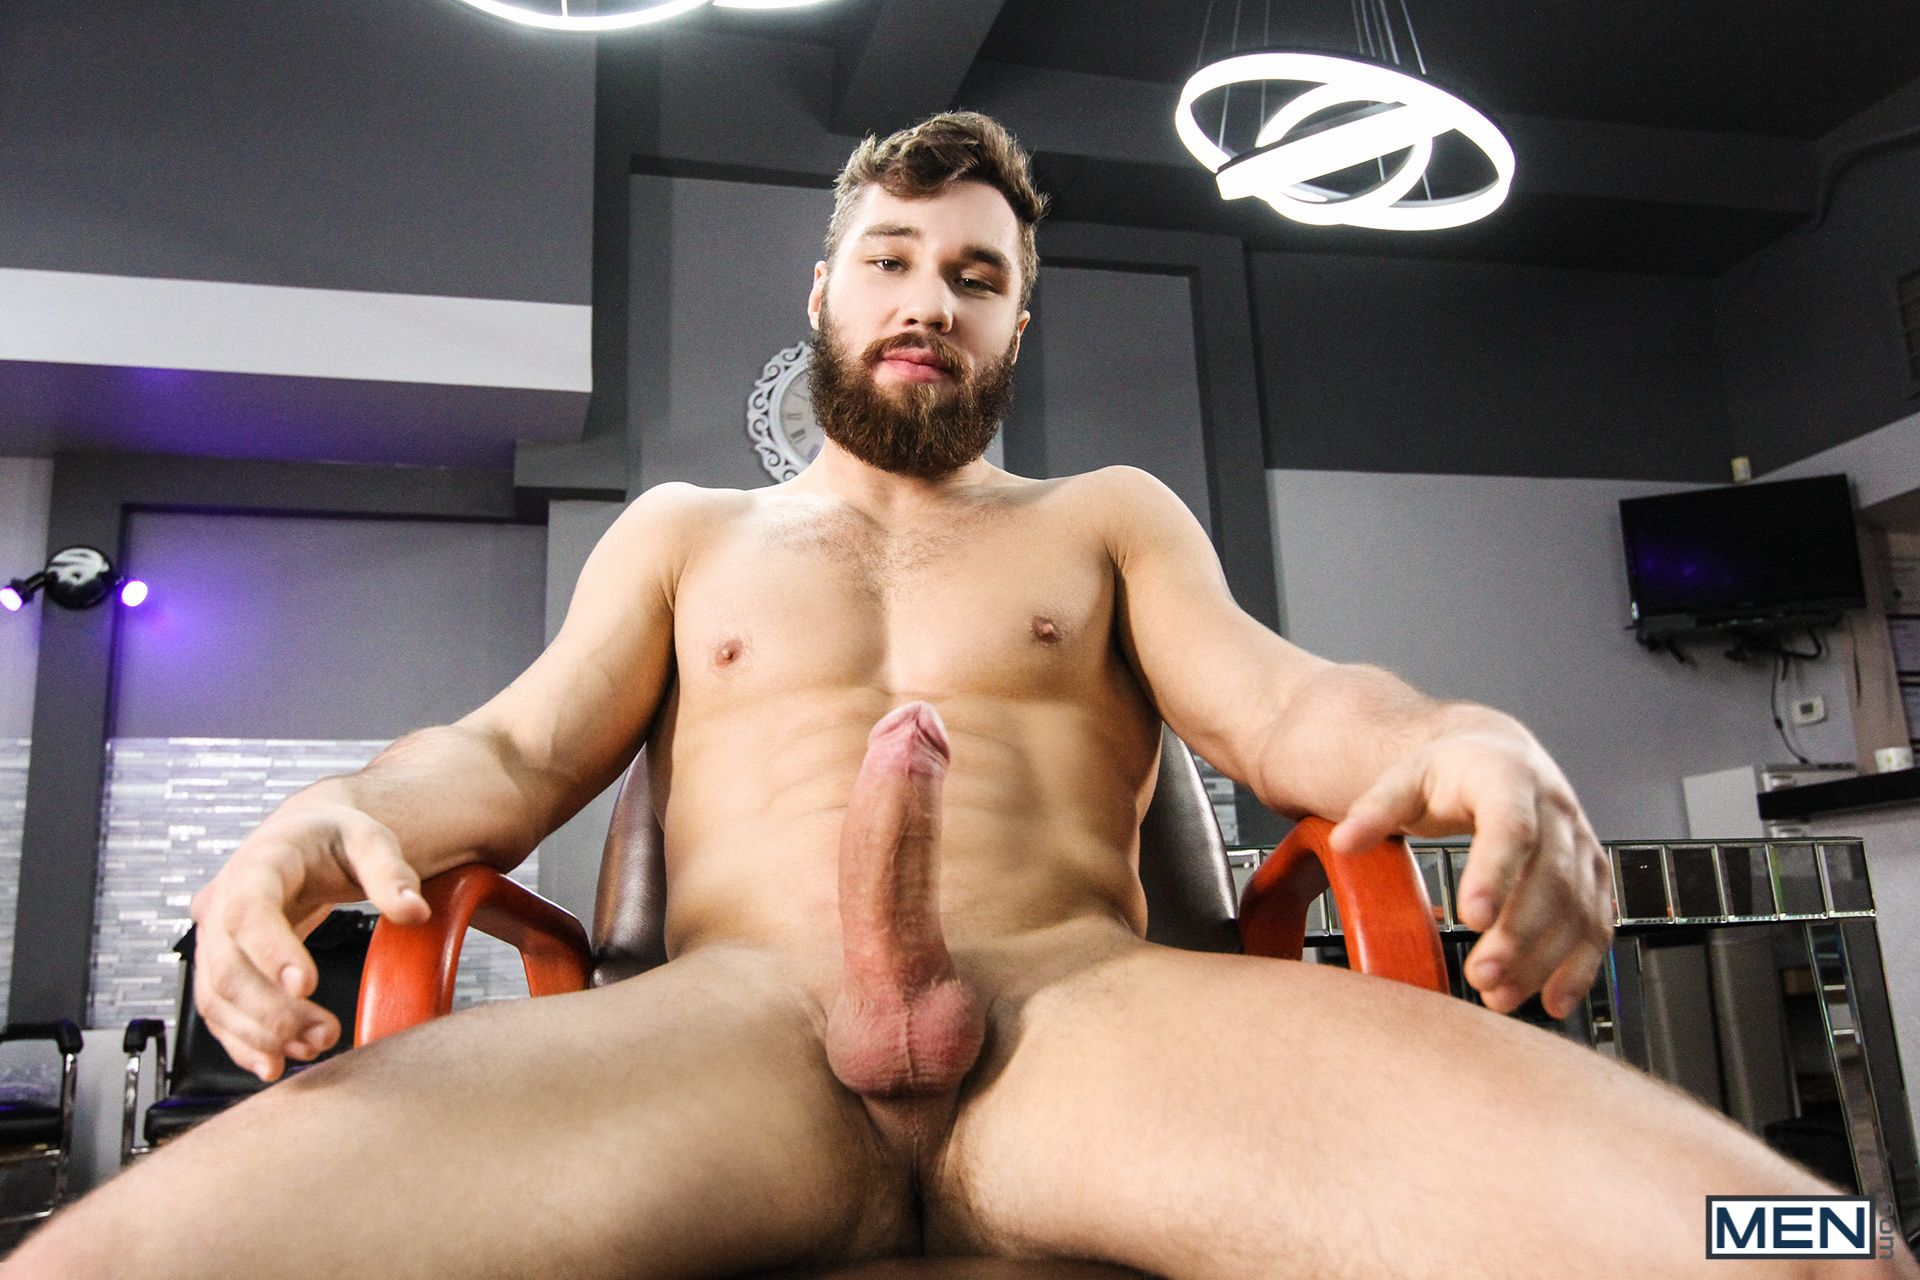 Crazy male pornstar kurt morgan in amazing blowjob, rimming gay xxx photo